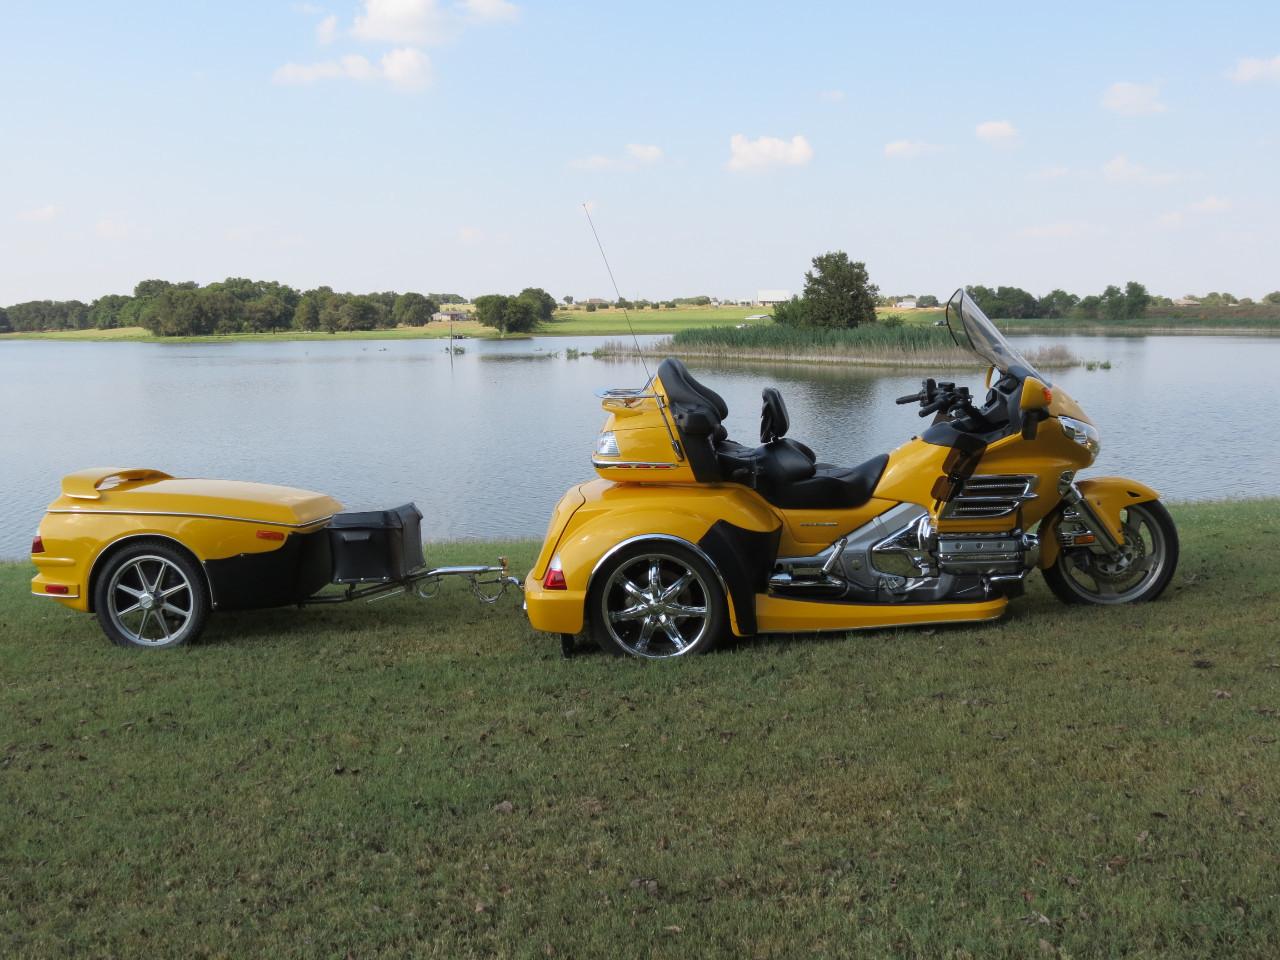 Honda Temple Tx 2010 Honda Gold Wing AUDIO COMFORT NAVI XM, Temple TX - - Cycletrader ...